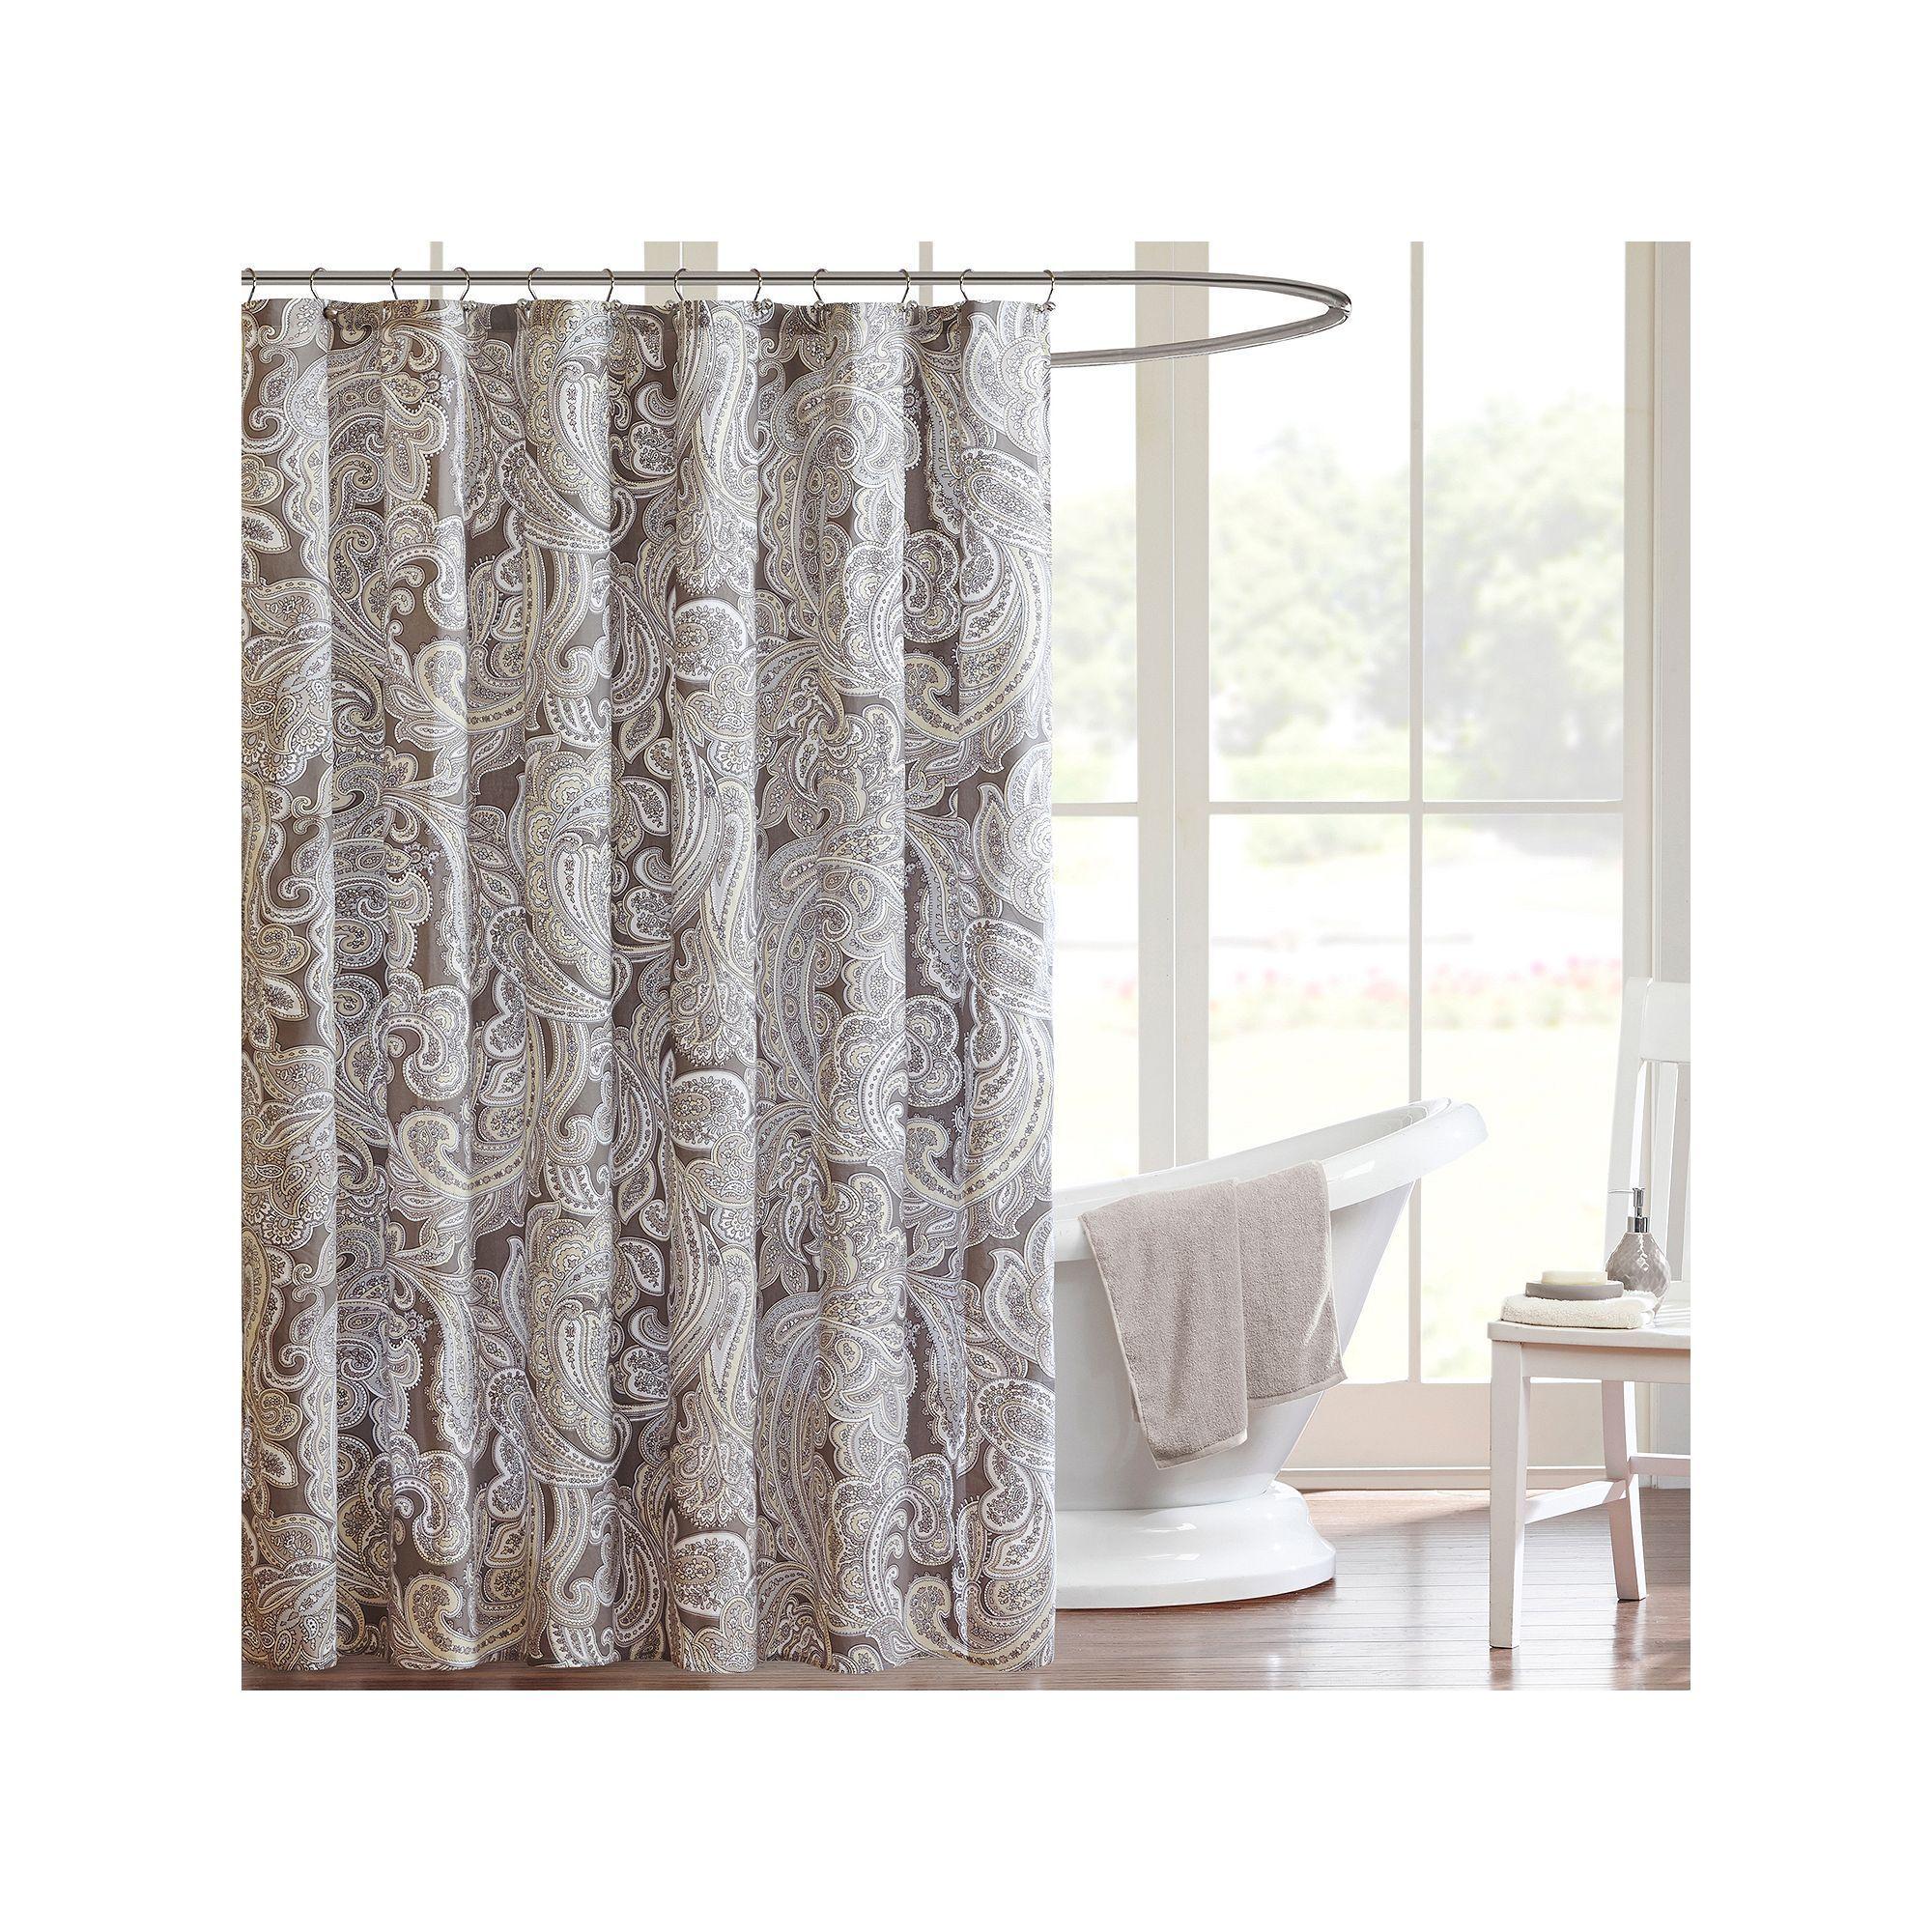 Madison park pure dermot shower curtain grey